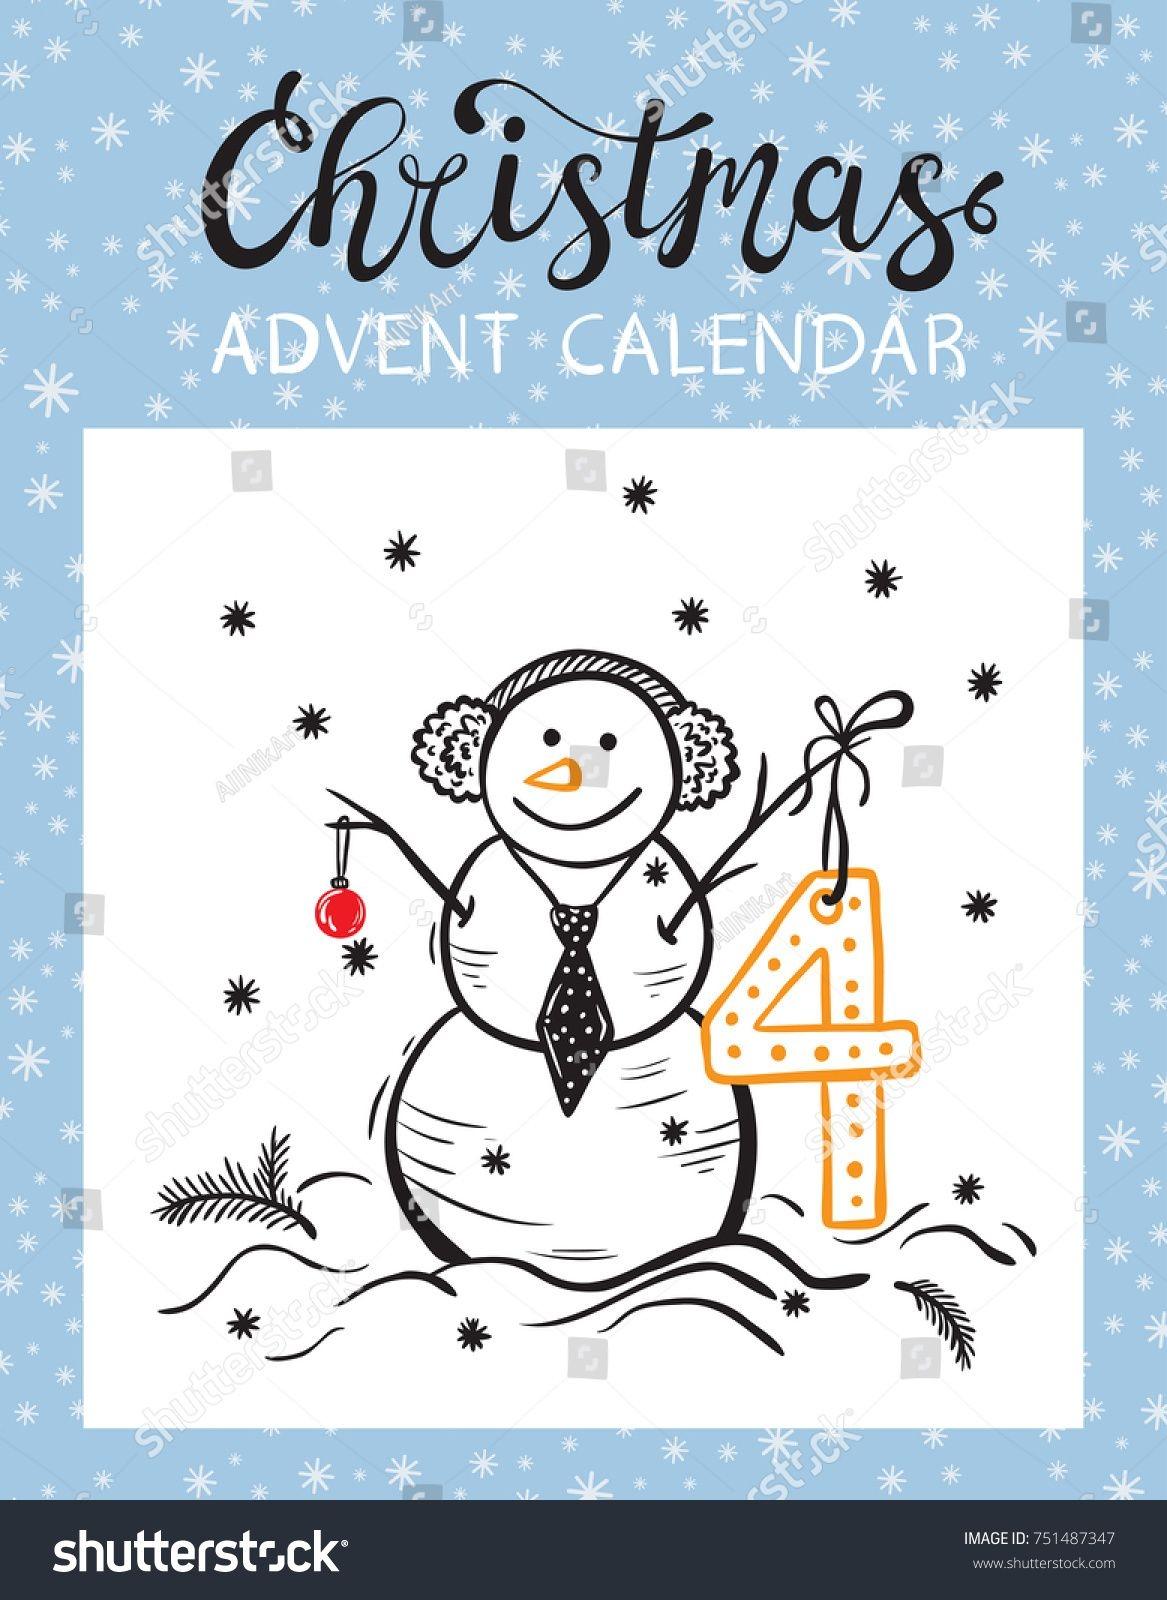 Christmas Advent Calendar Printable Card Tearoff Stock